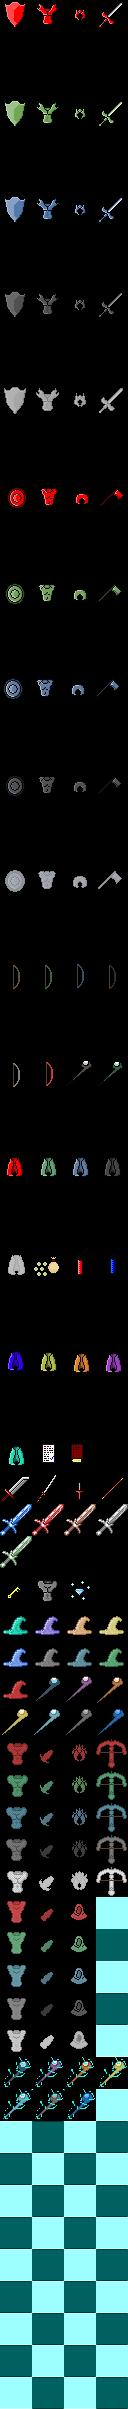 items-basicos